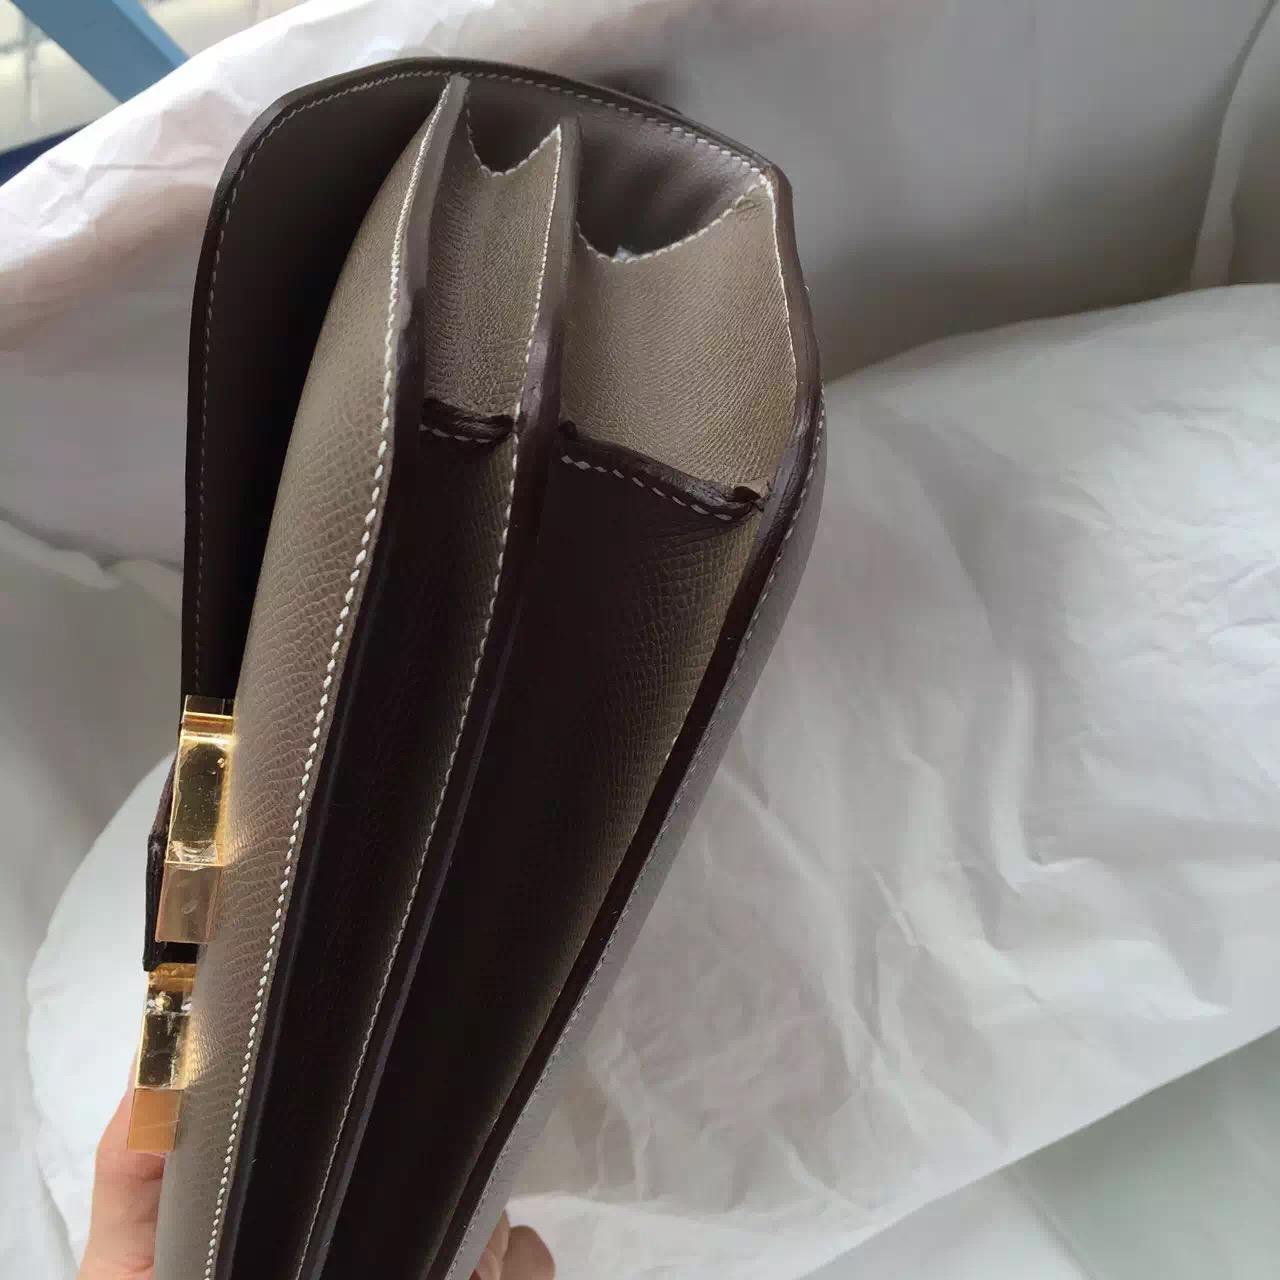 Discount C18 Etoupe Grey Epsom Leather Hermes Constance Bag Summer Message Bag